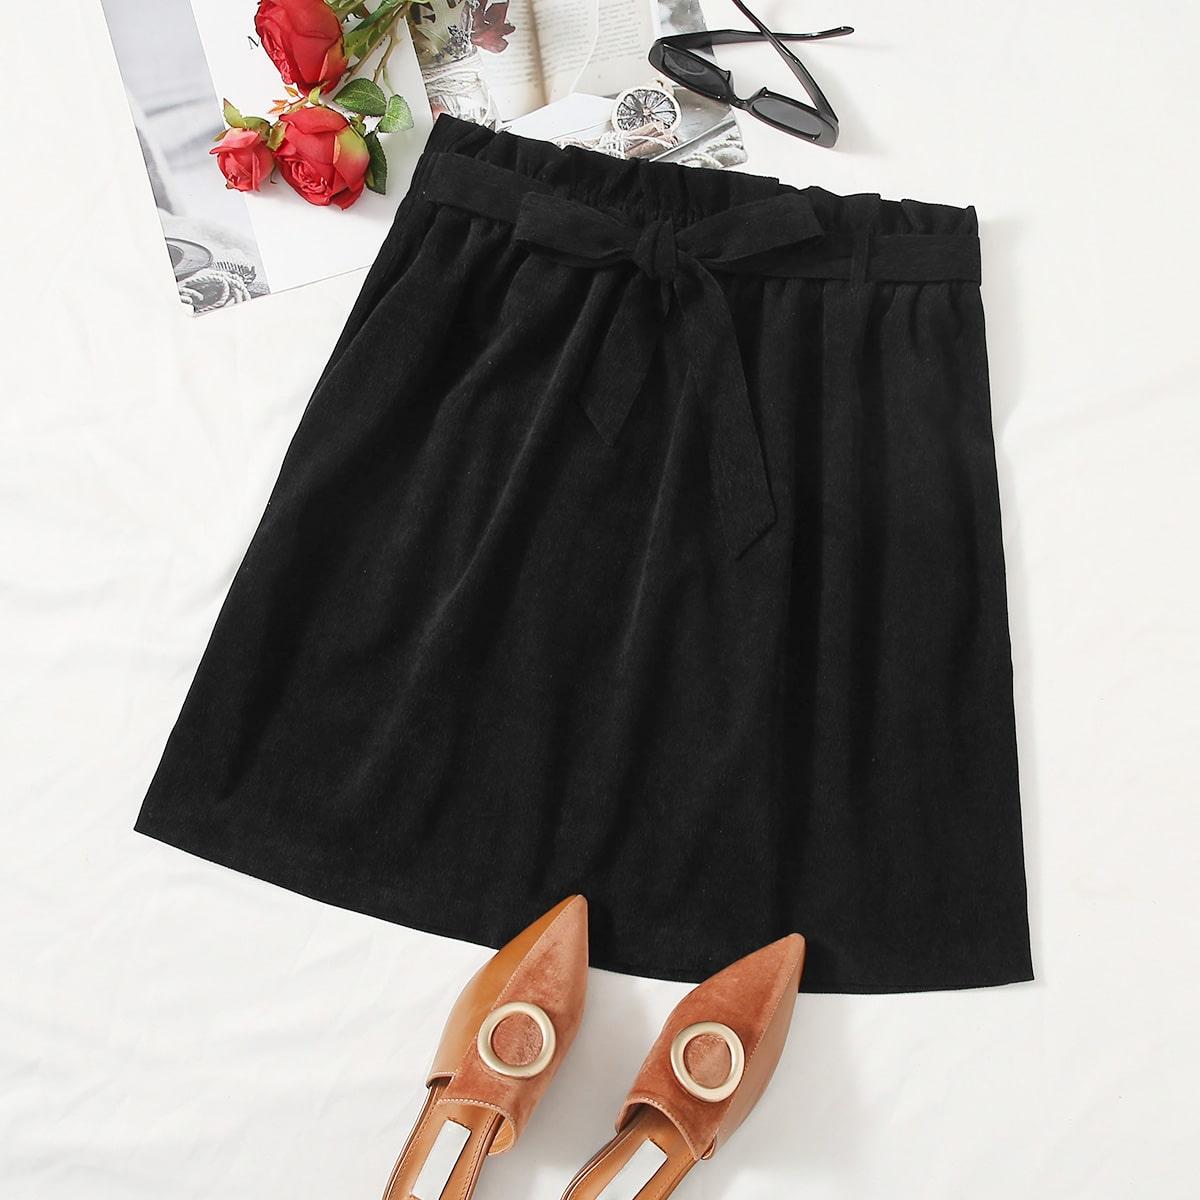 SHEIN / Plus Paperbag Waist Belted Corduroy Skirt